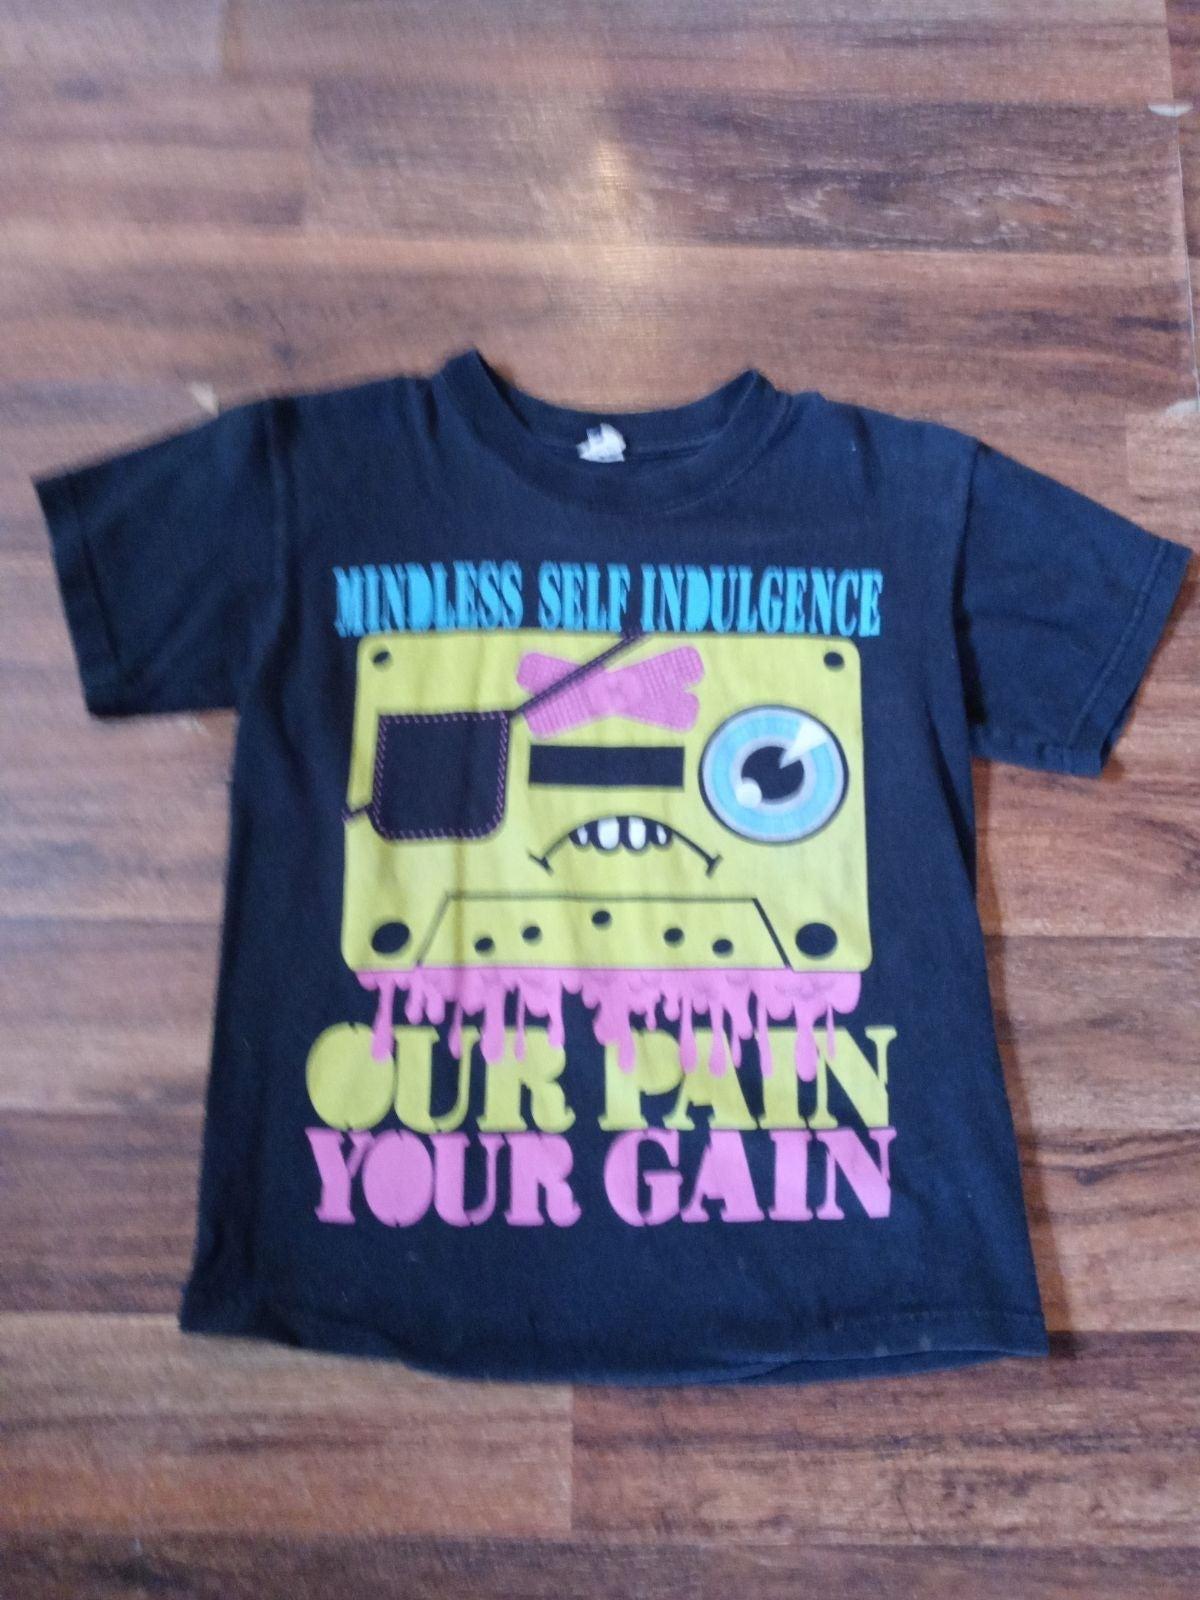 Mindless Self Indulgence Shirt